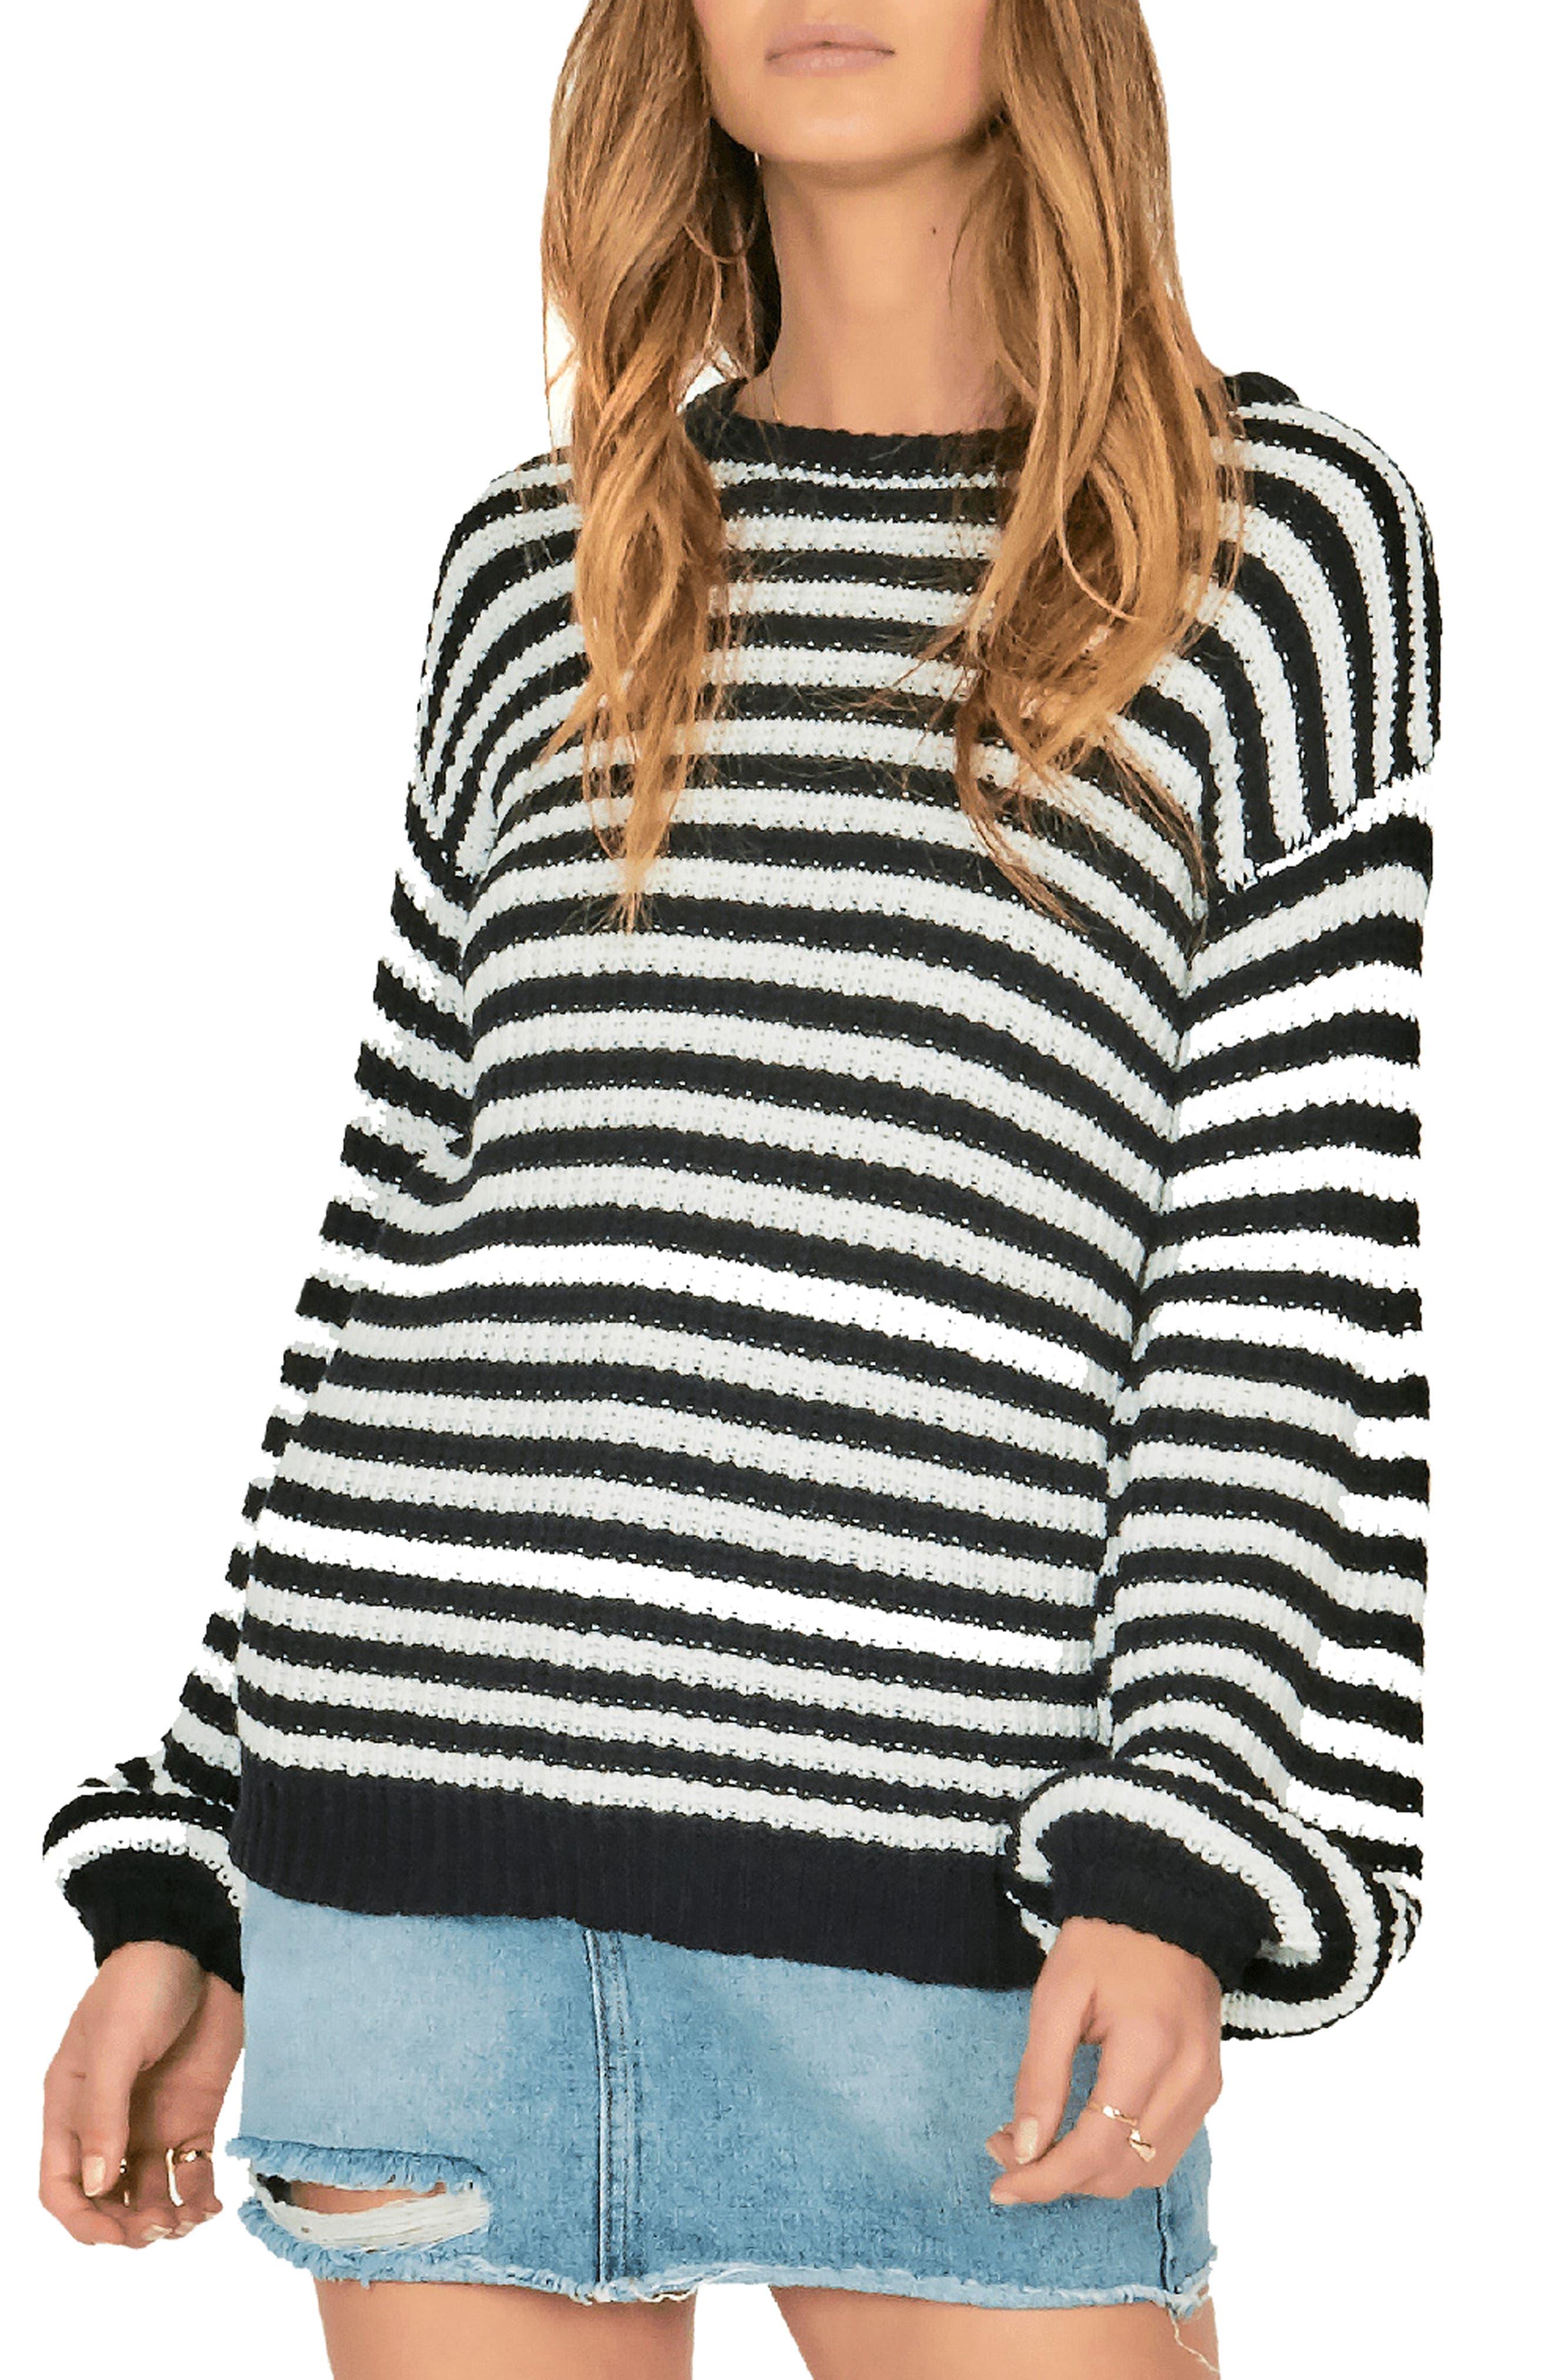 AMUSE SOCIETY Rodas Balloon Sleeve Sweater in Stripe